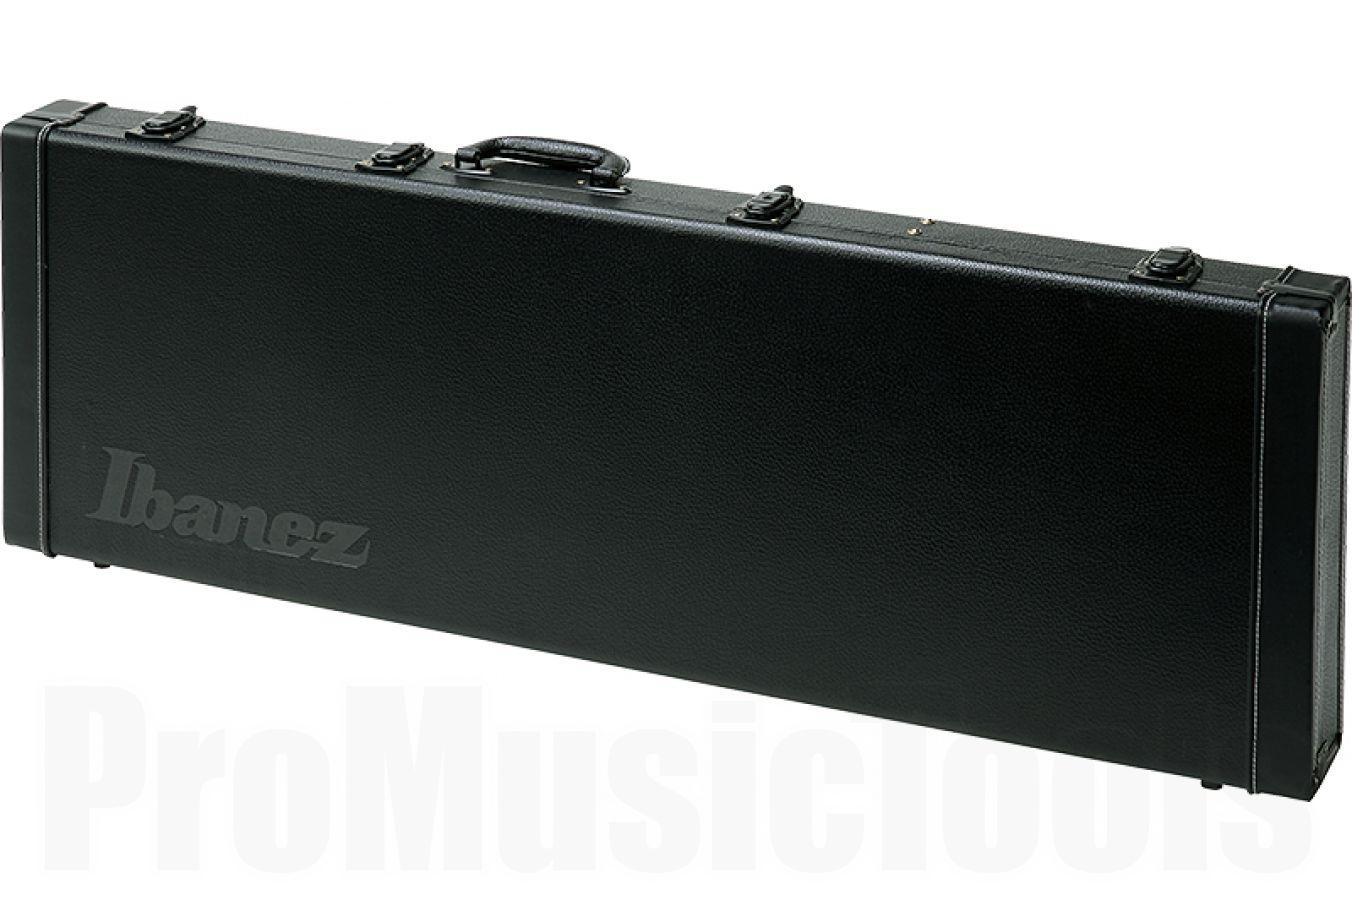 Ibanez W101RG Wooden Case for RG,RG7, RGD, RGD7, RG8, RG9, S, SA